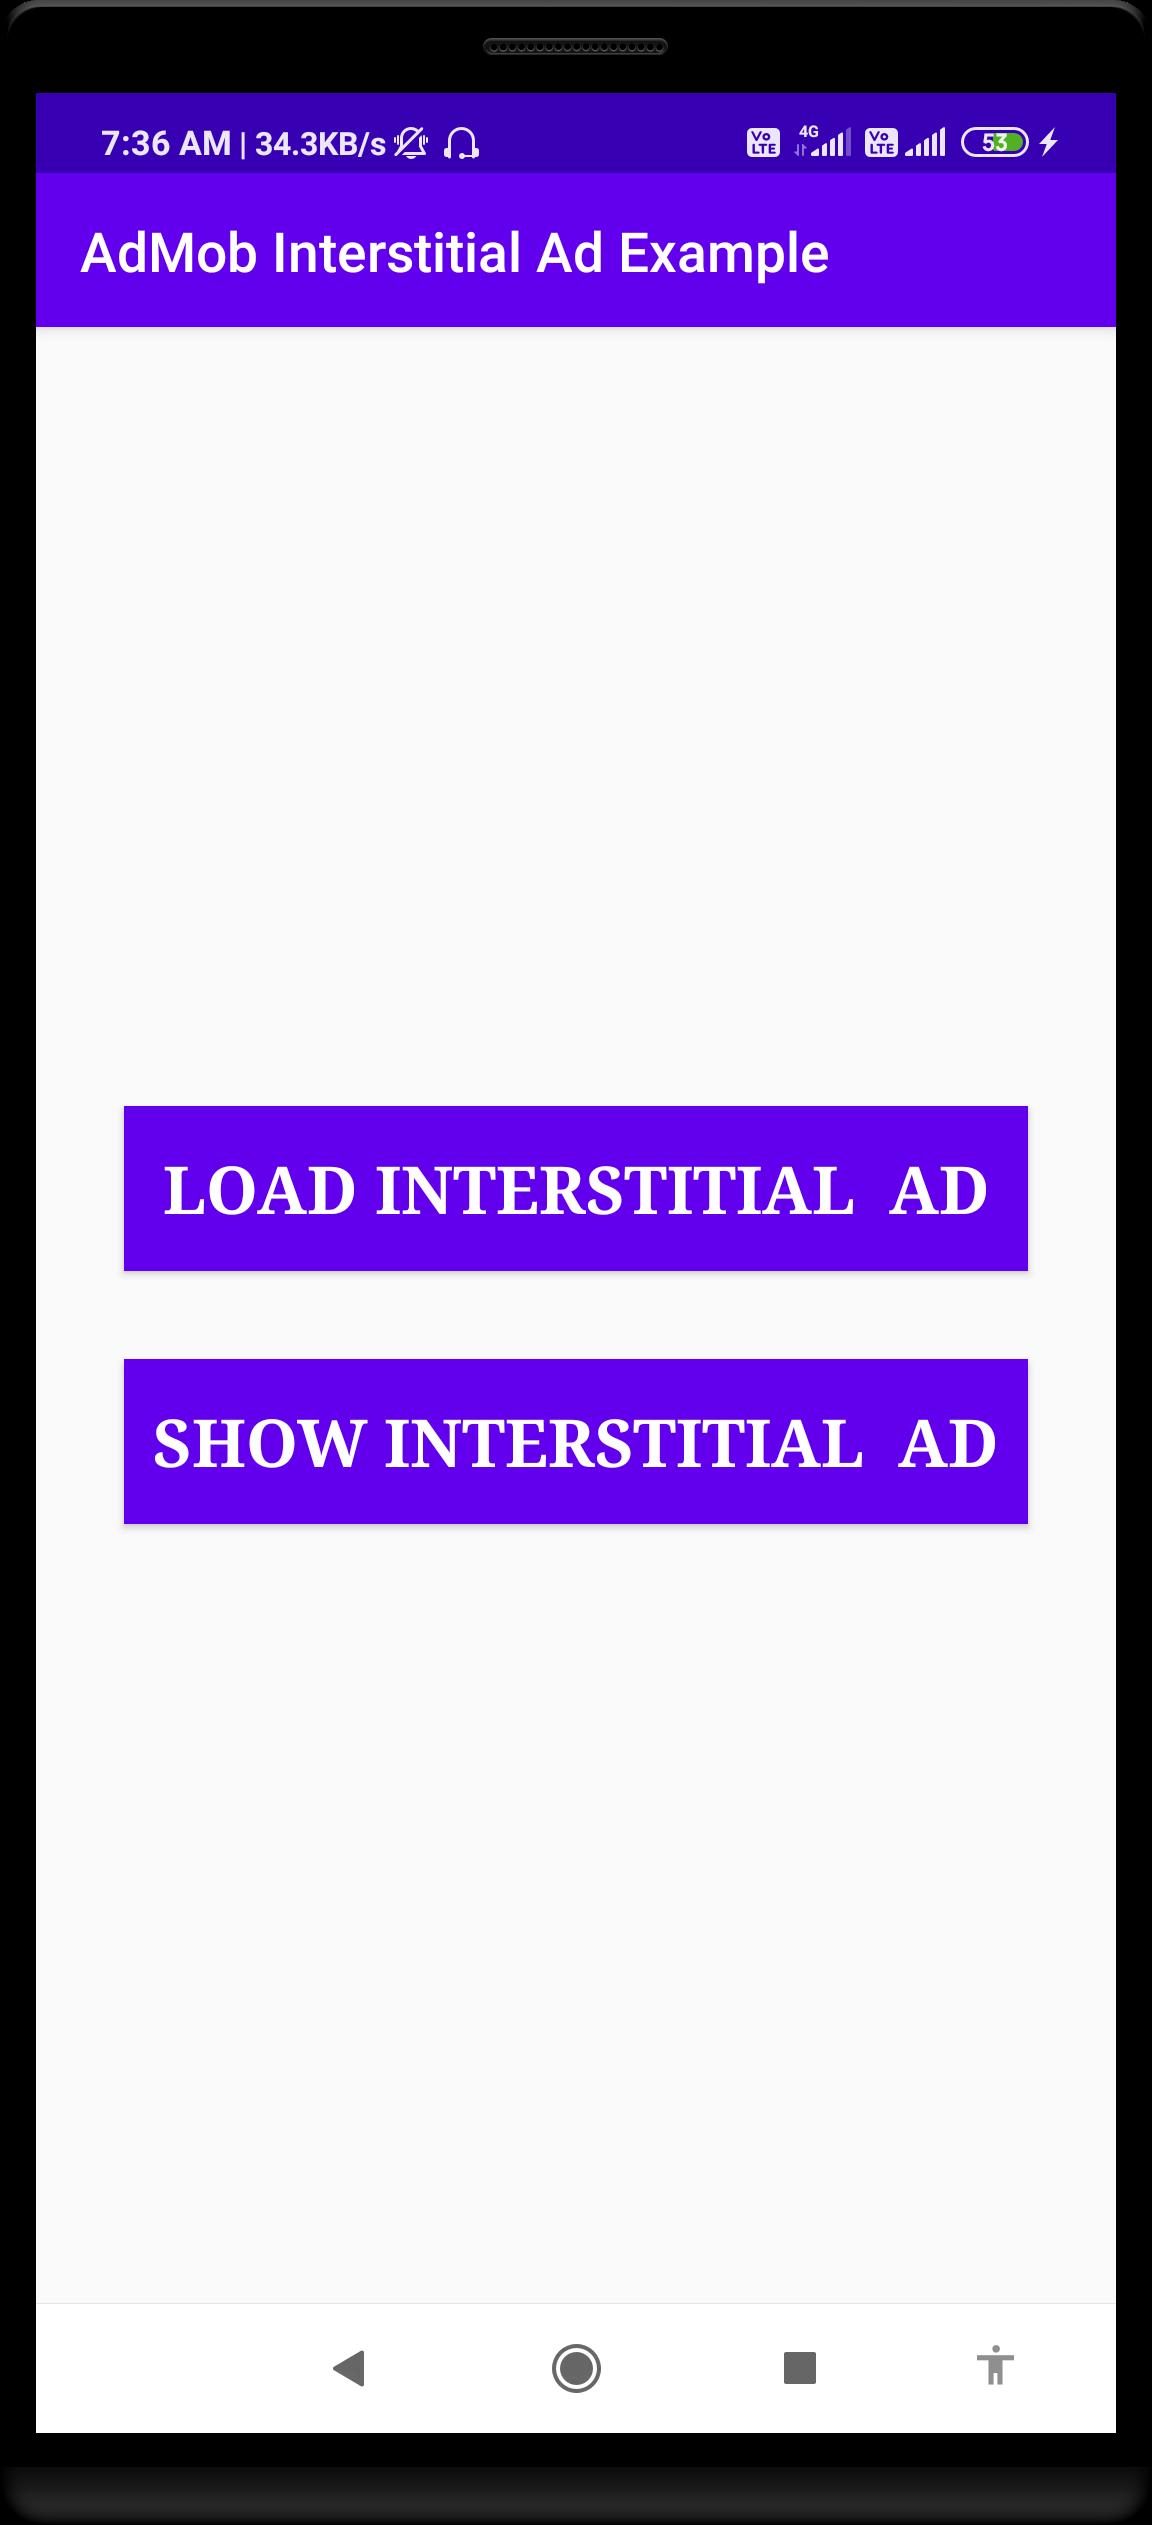 AdMob Interstitial Ad